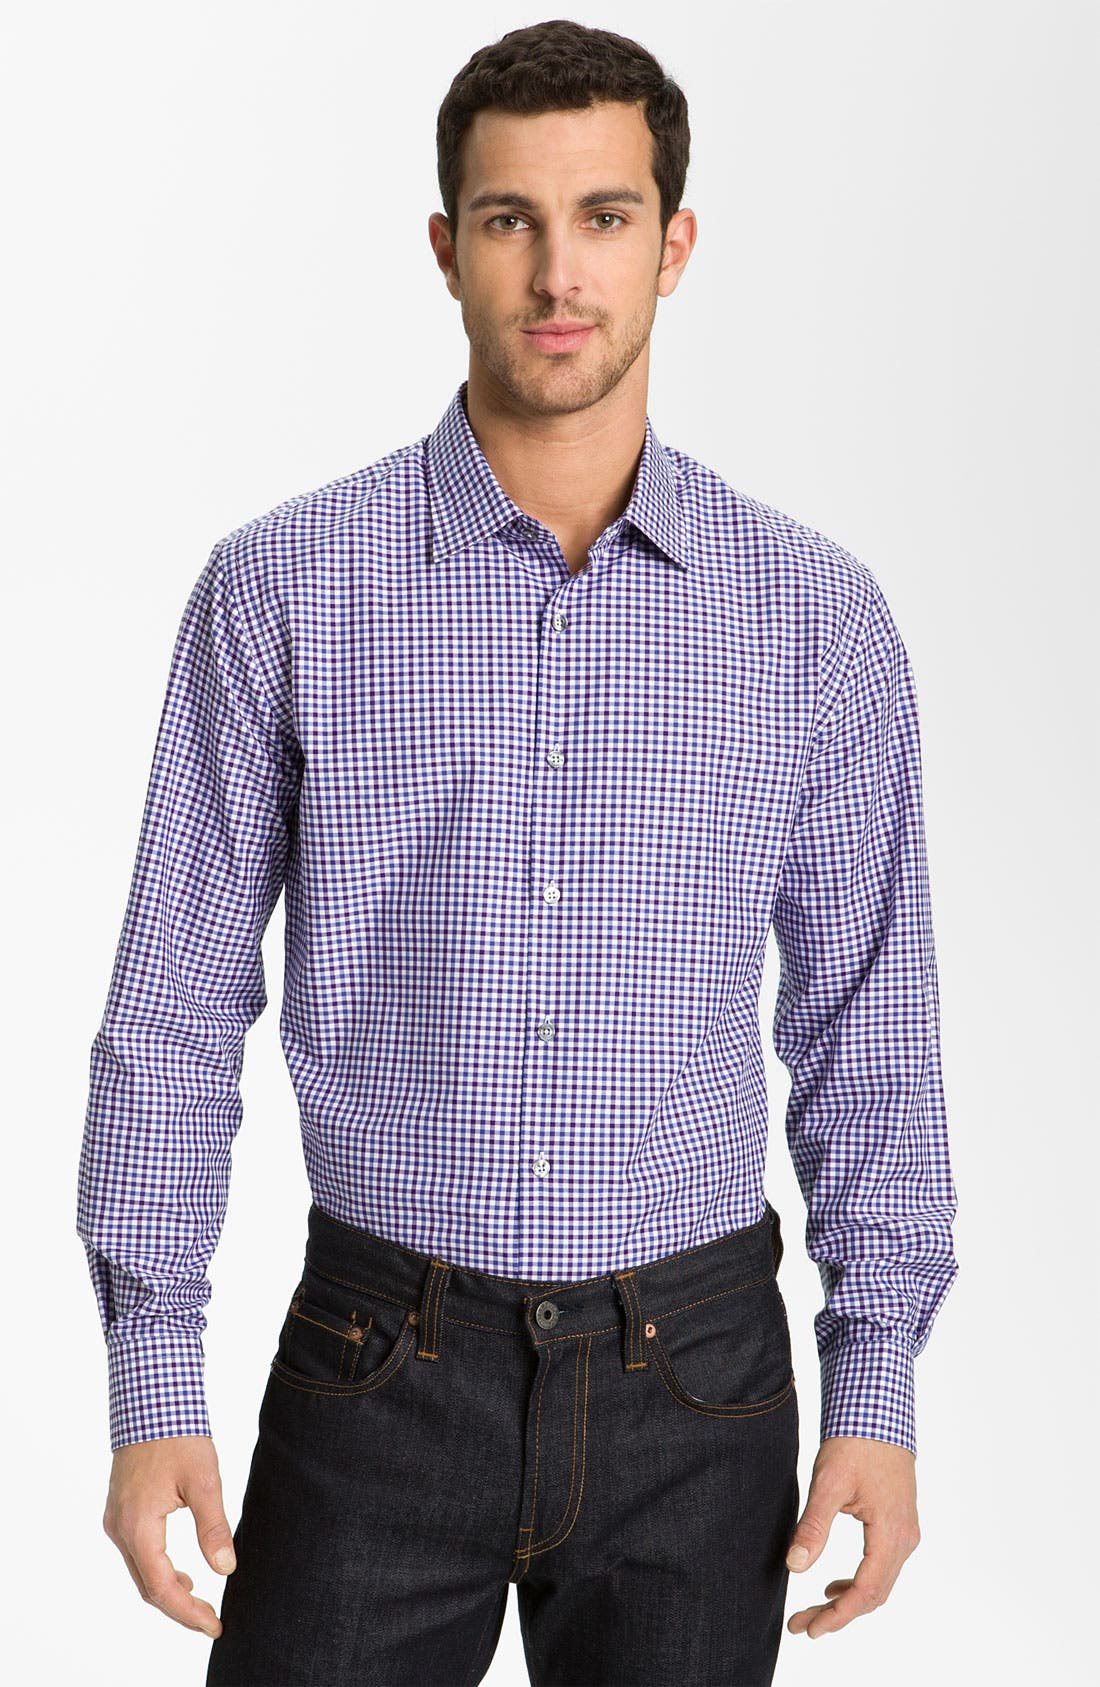 Alternate Image 1 Selected - Paul Smith London Trim Fit Gingham Check Dress Shirt